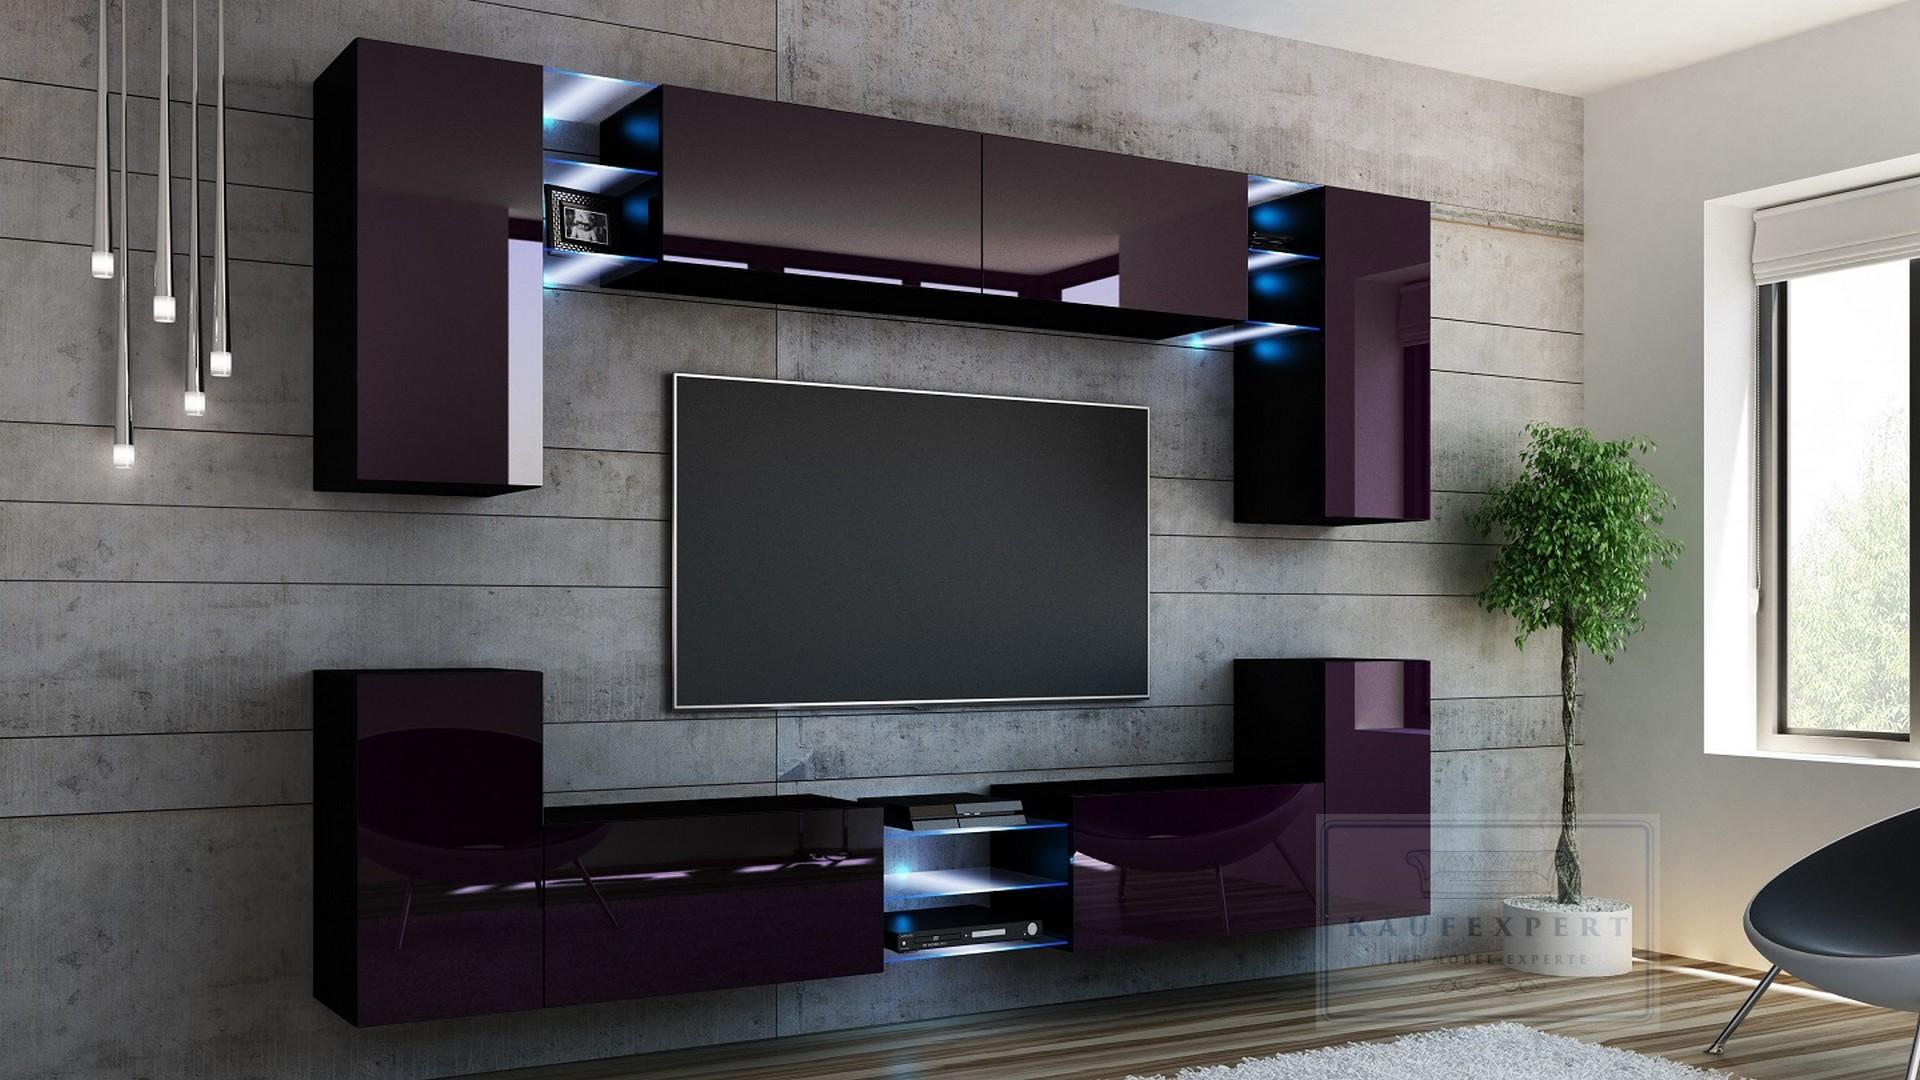 wohnzimmer ideen kolonial. Black Bedroom Furniture Sets. Home Design Ideas